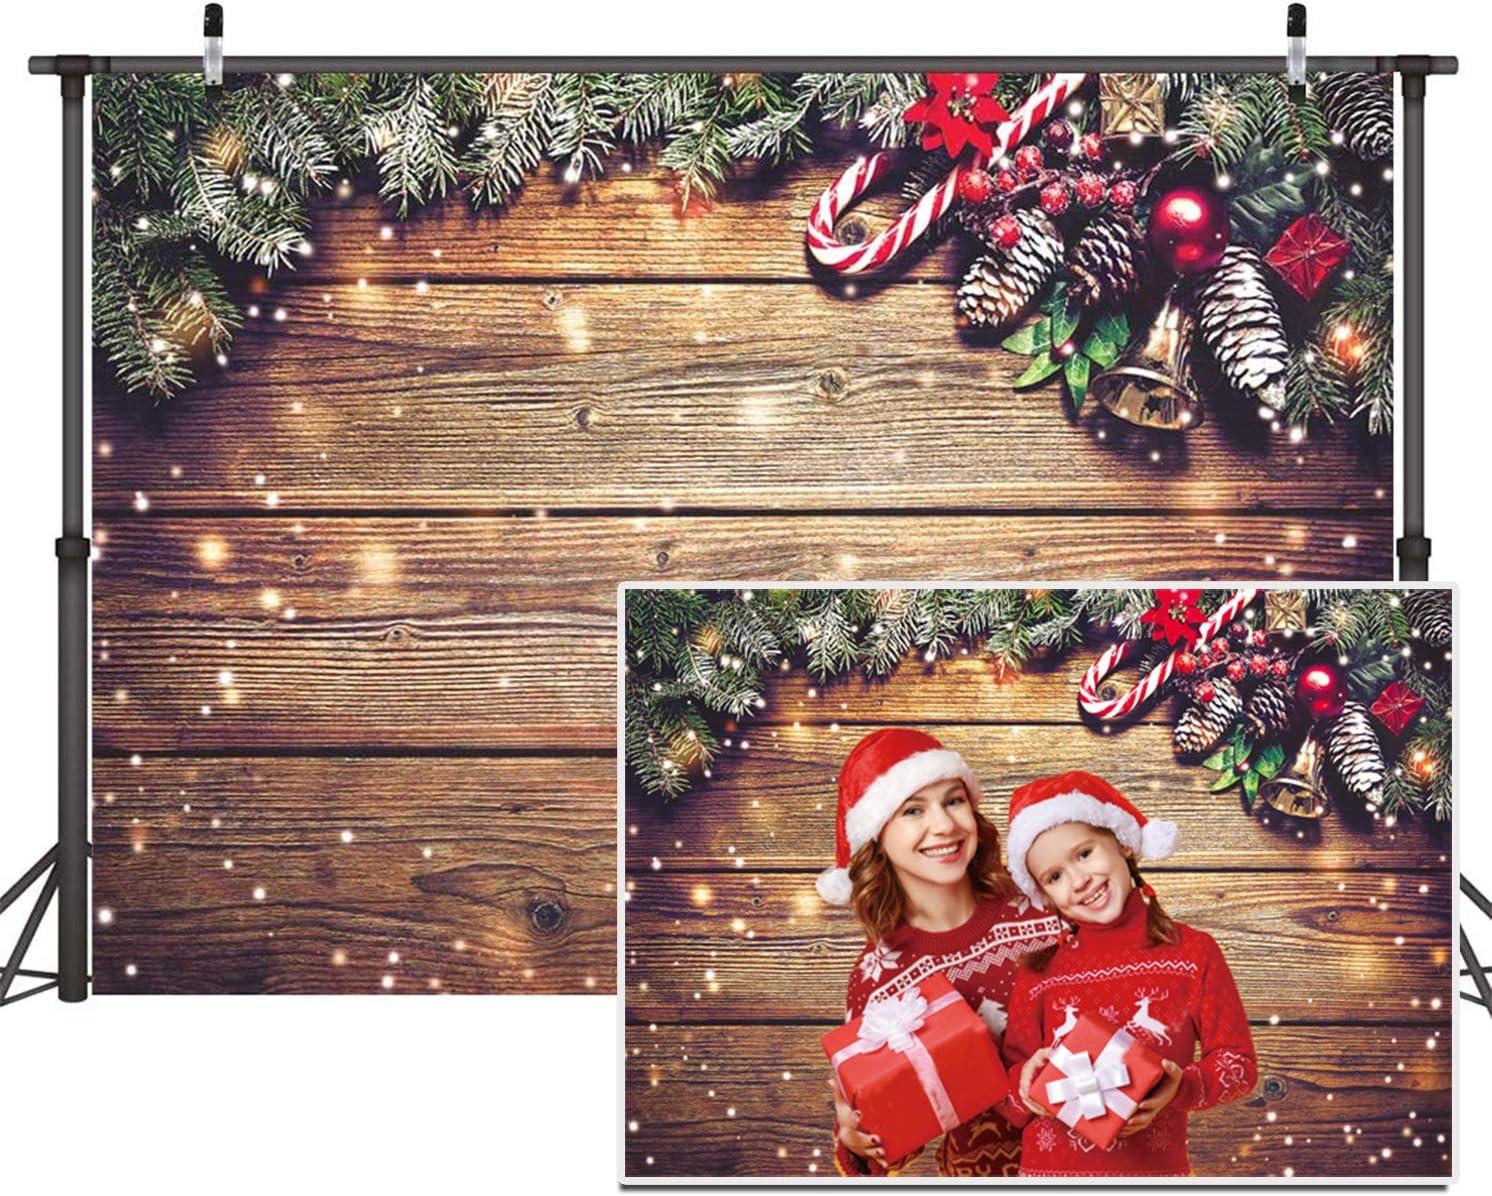 Christmas Photography Backdrop Wood Texture Floor Photo Background Snowflake Happy Holidays Photo Booth Backdrops Studio Photo Backdrop